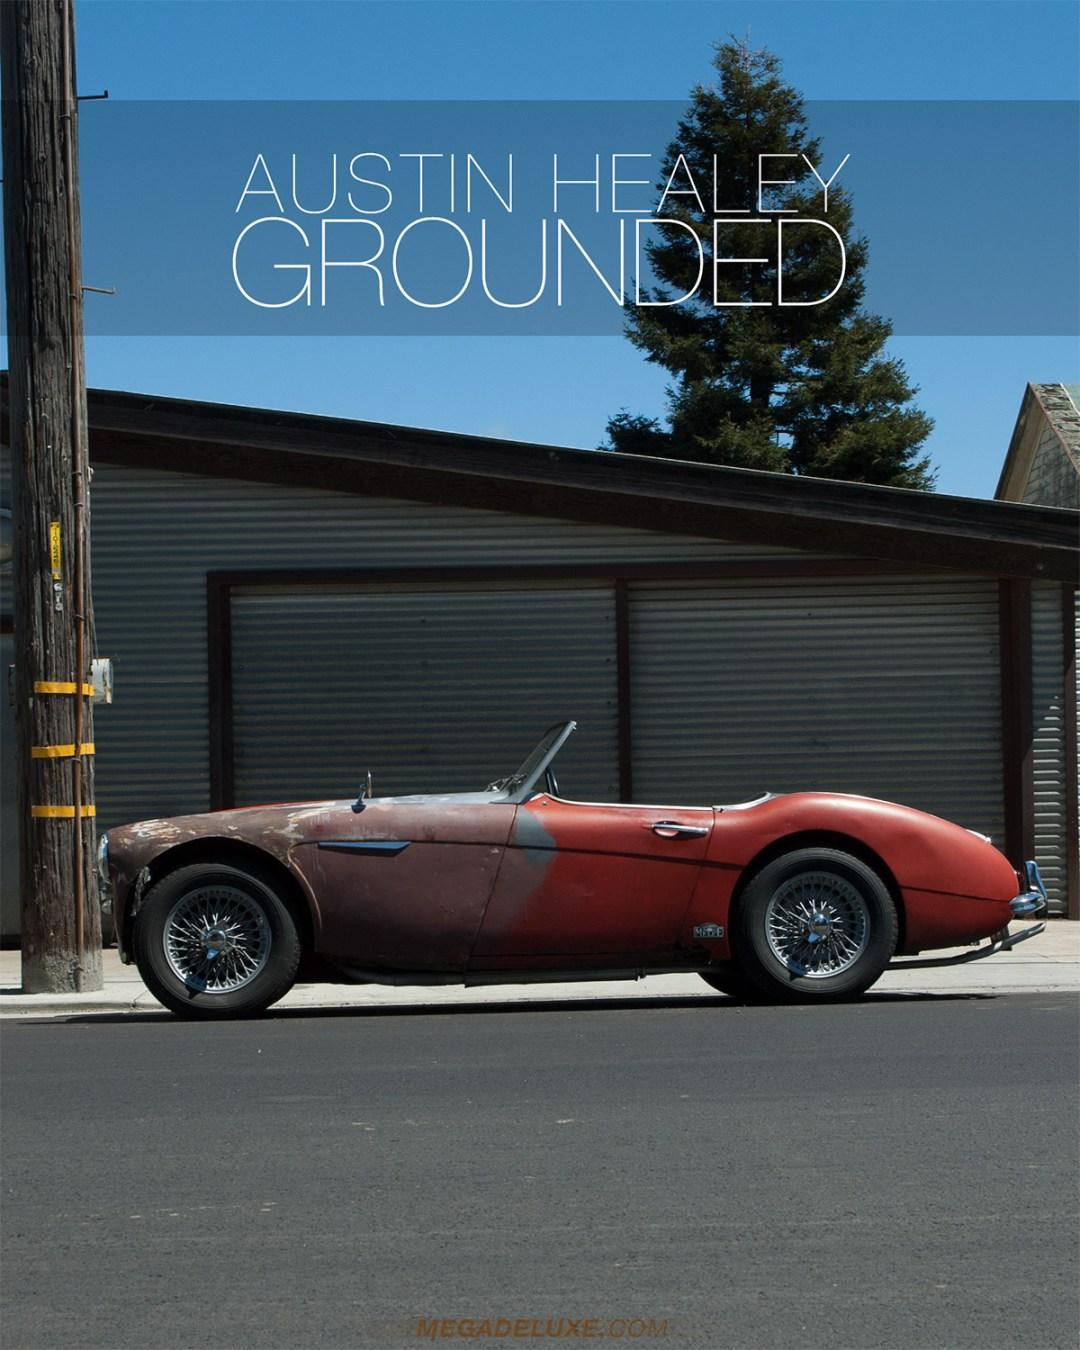 austin-healey-grounded